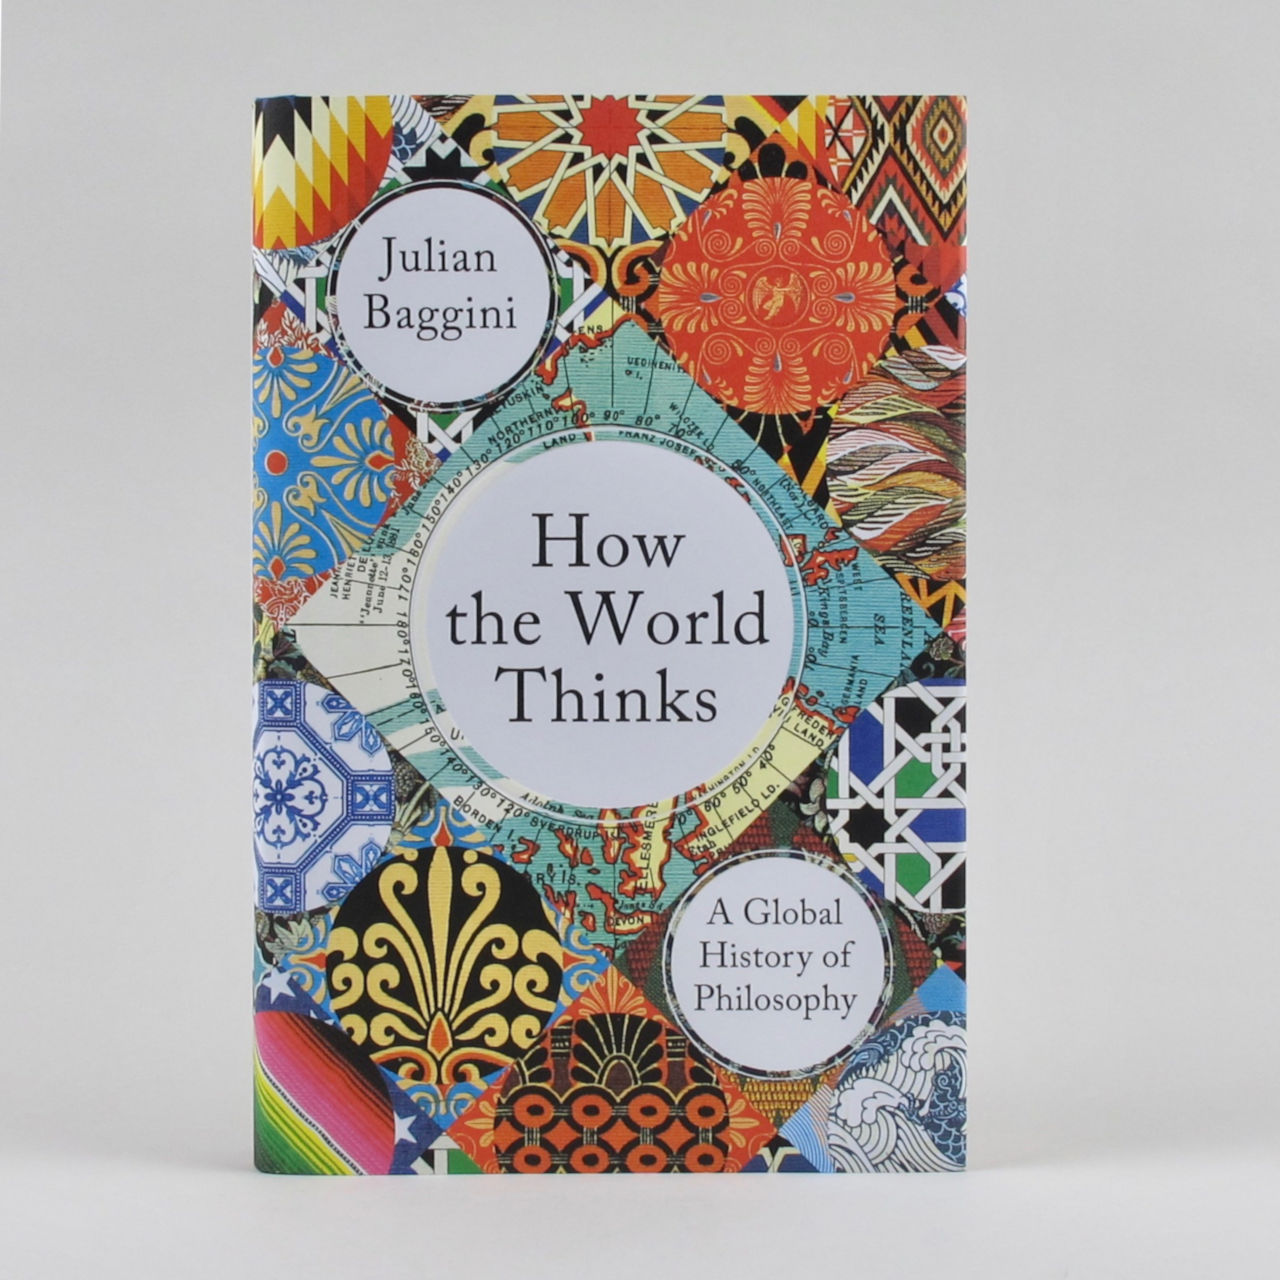 How the World Thinks - Julian Baggini